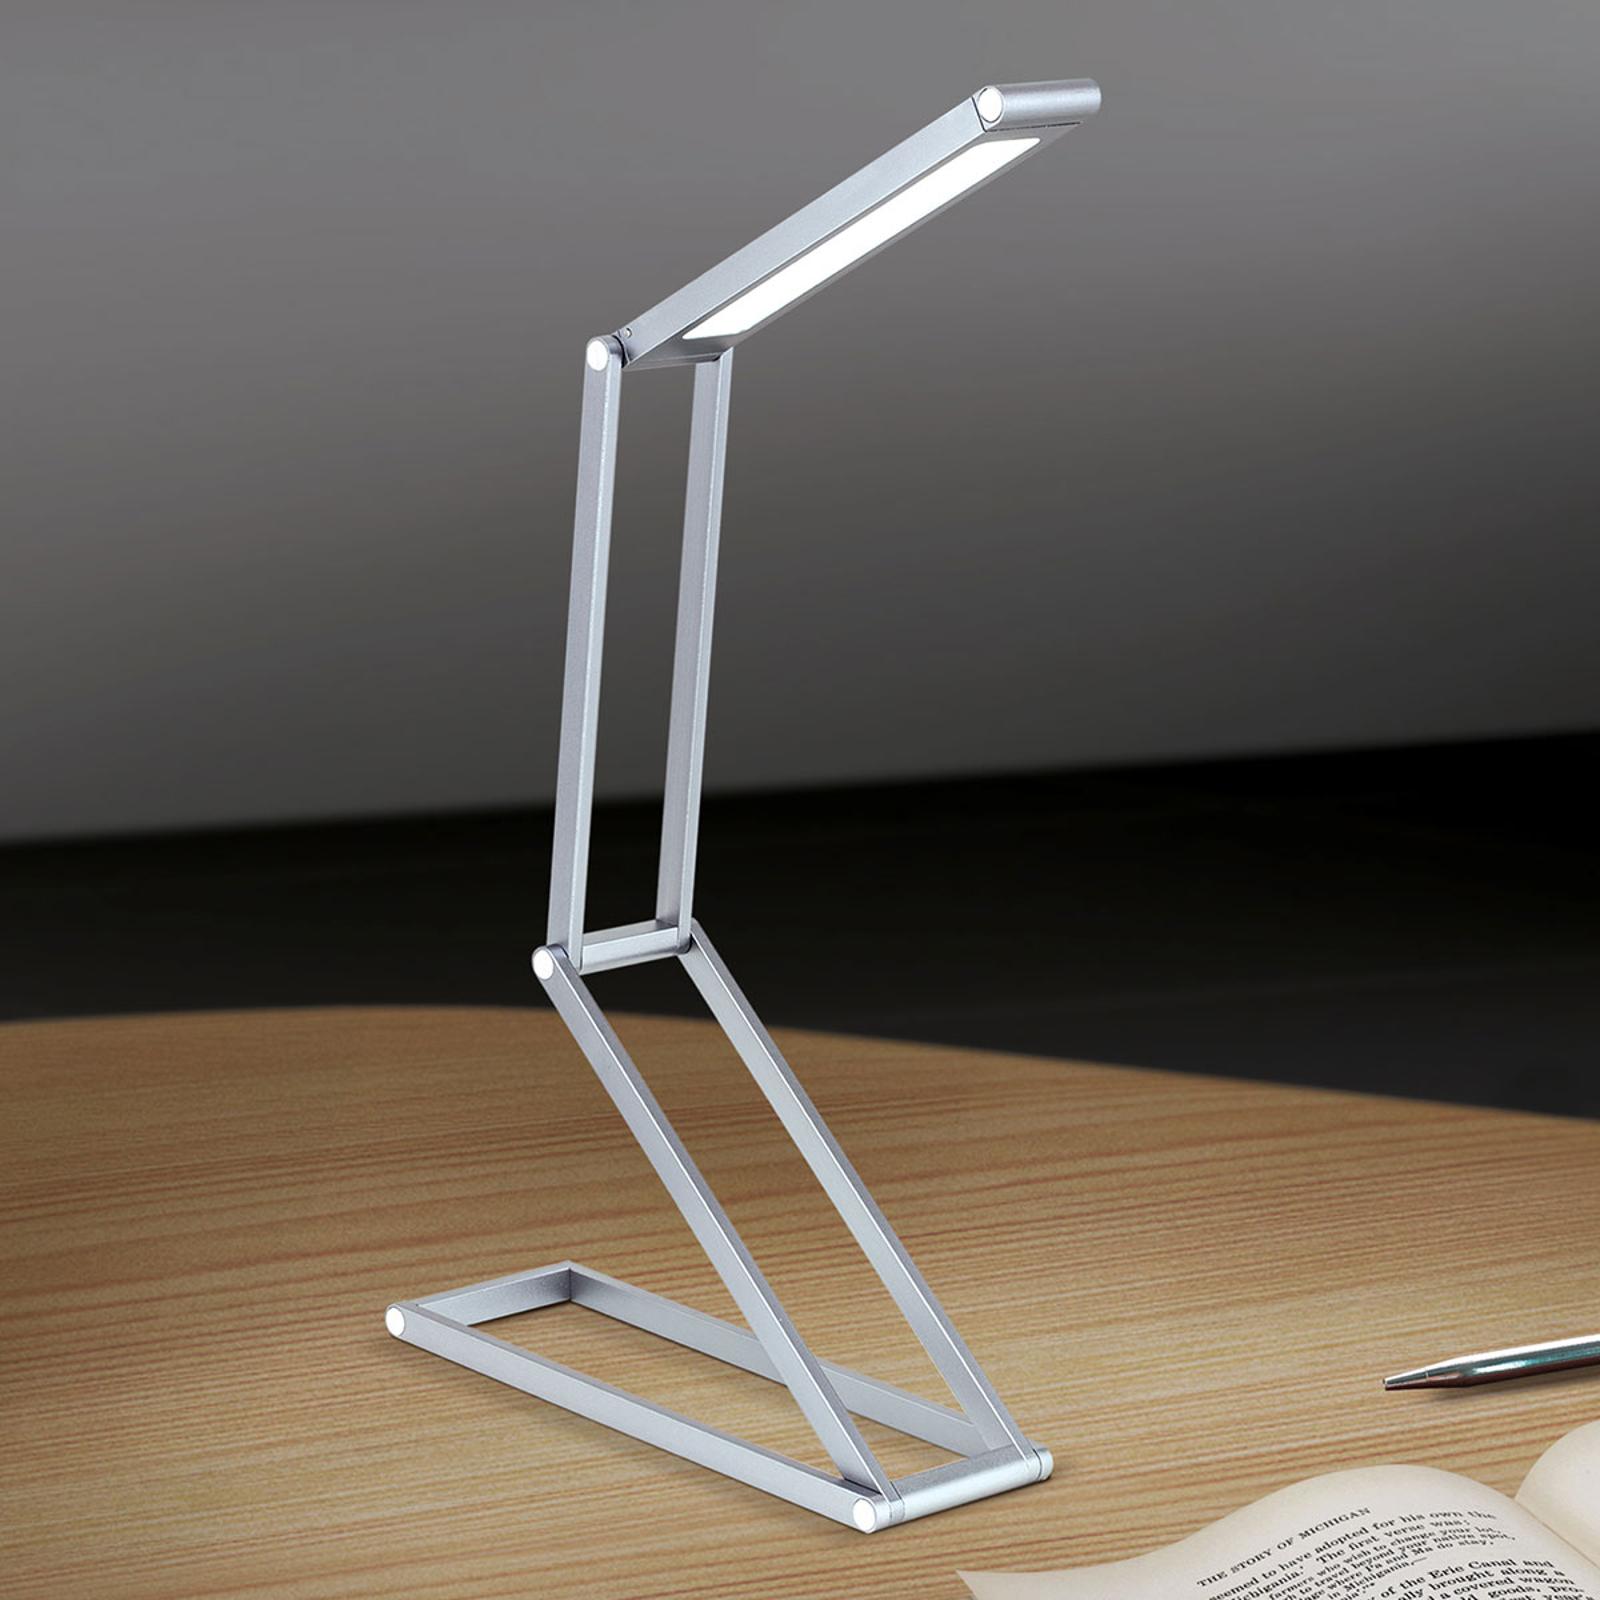 Opvouwbare LED tafellamp Falto met accu, antraciet